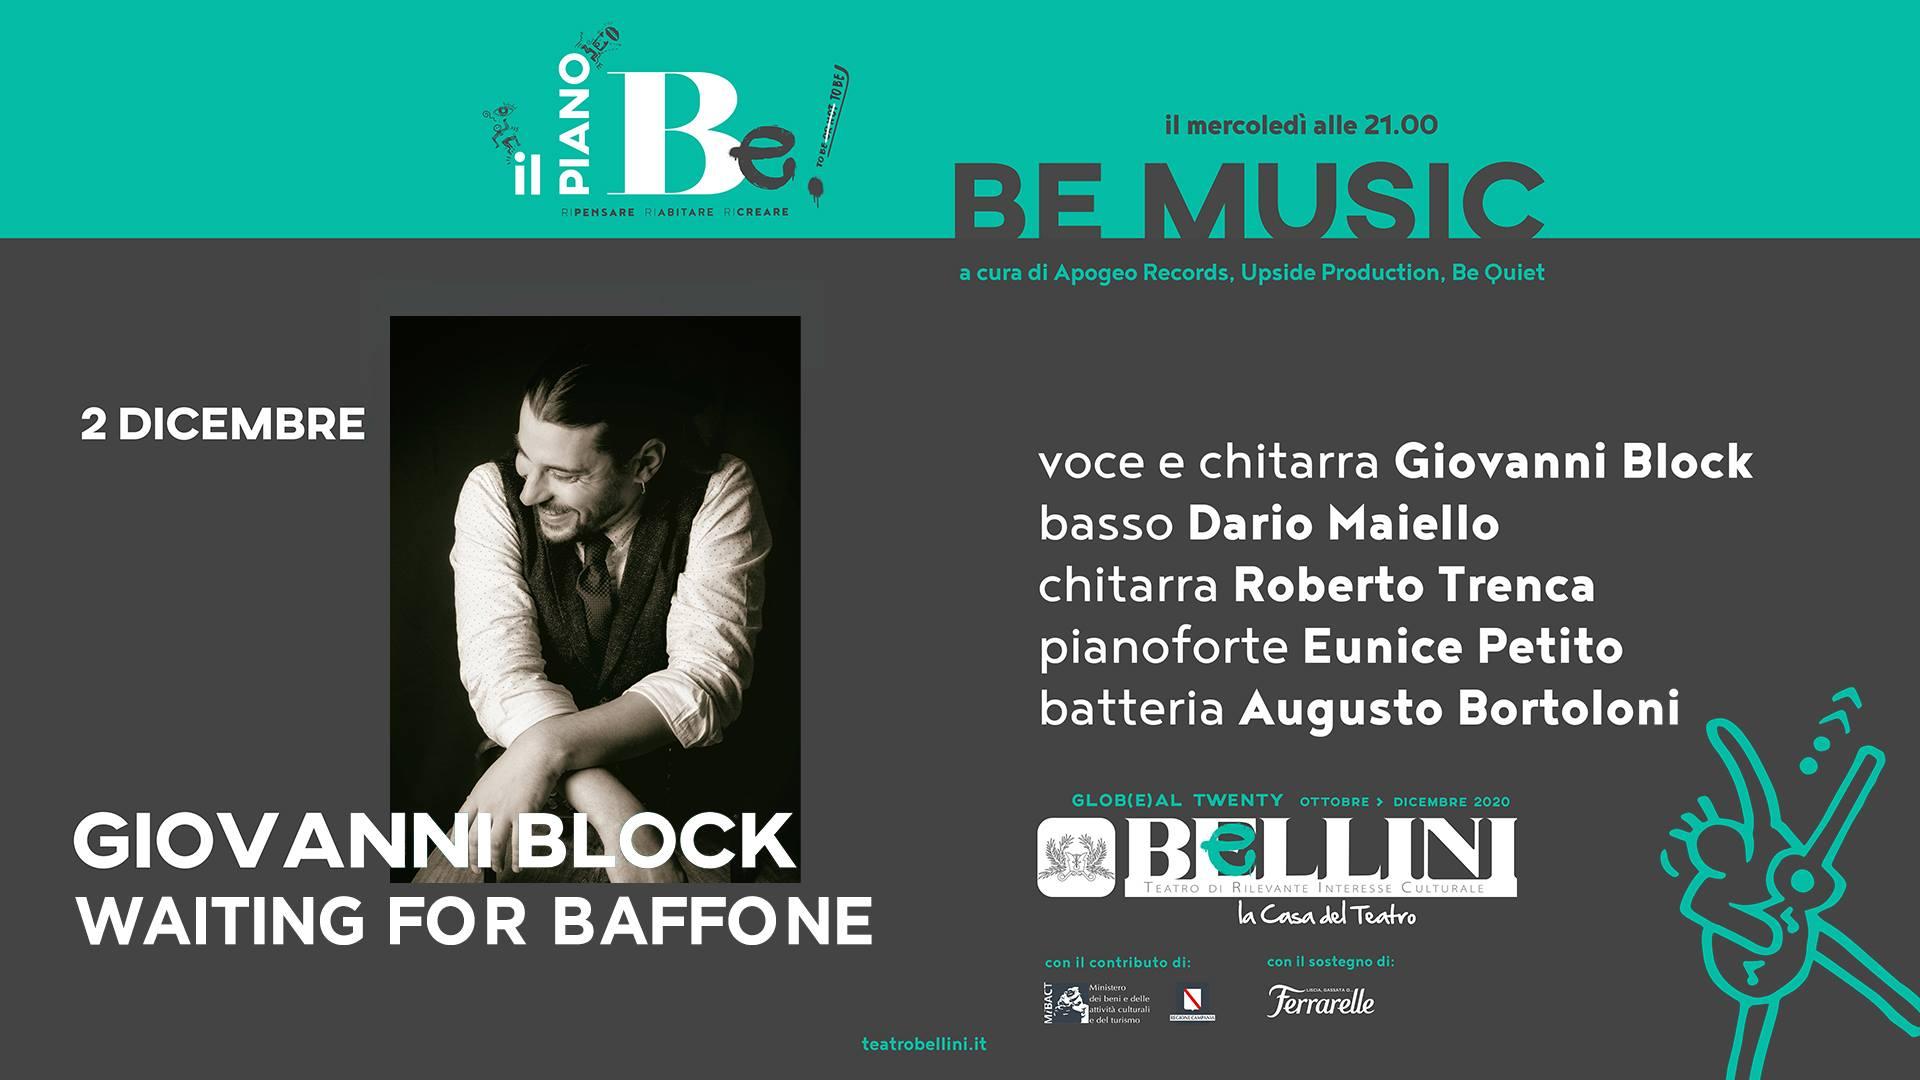 BeMusic - Piano BeAnticovid - Annullato causa Pandemia